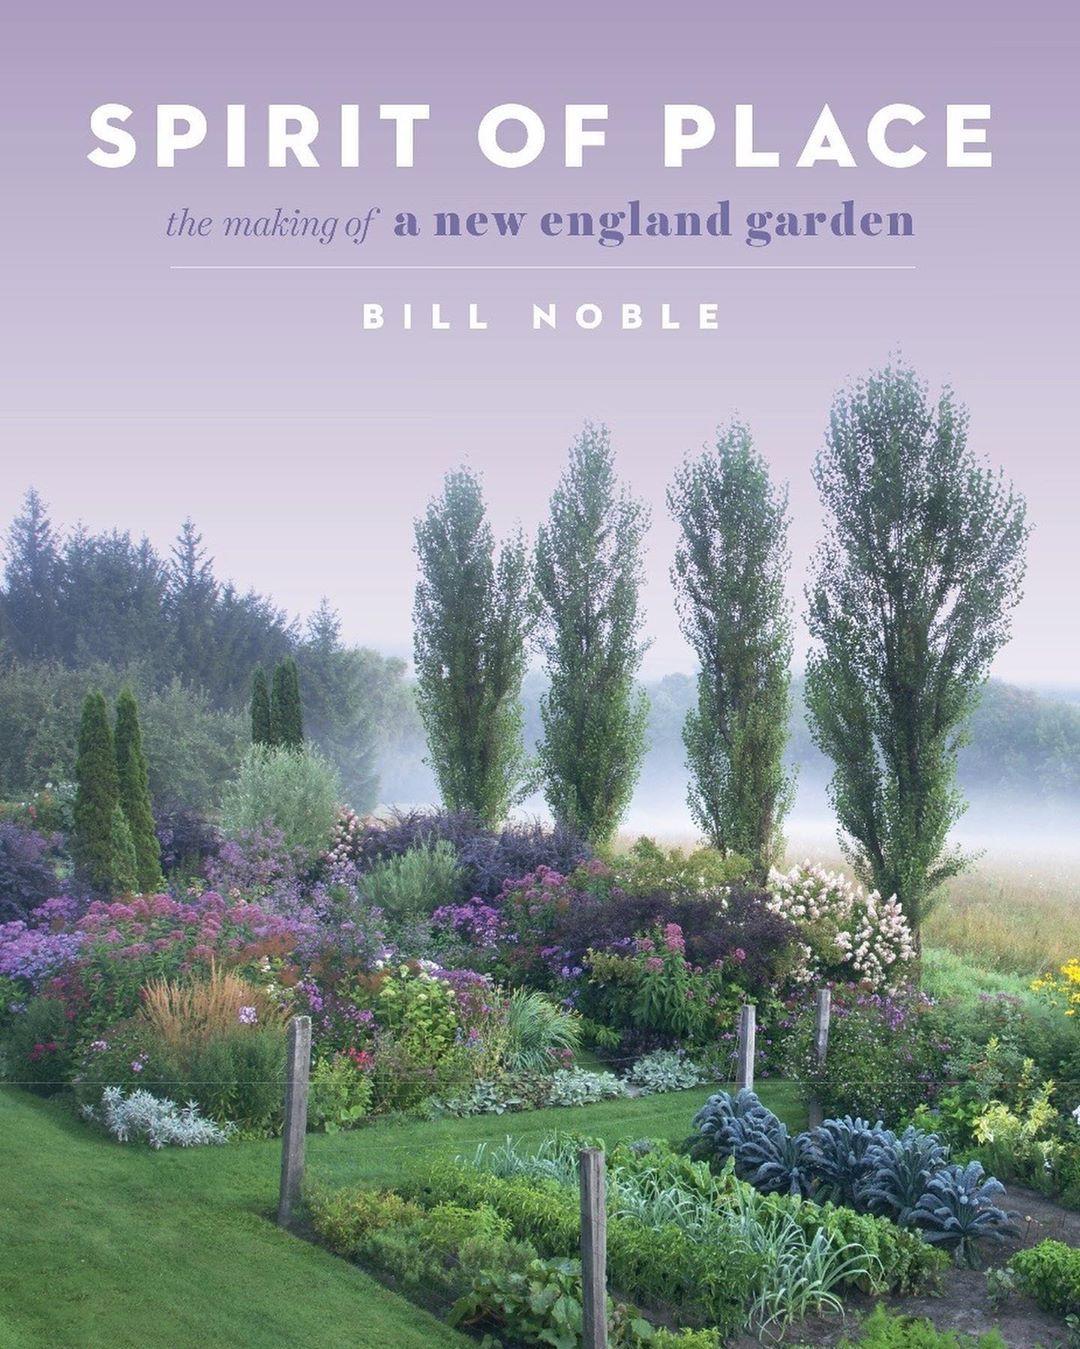 Garden Design Magazine On Instagram Book Giveaway Time Win A Copy Of The Brand New Spirit Of Place By In 2020 Garden Design Magazine Gardening Books Garden Design